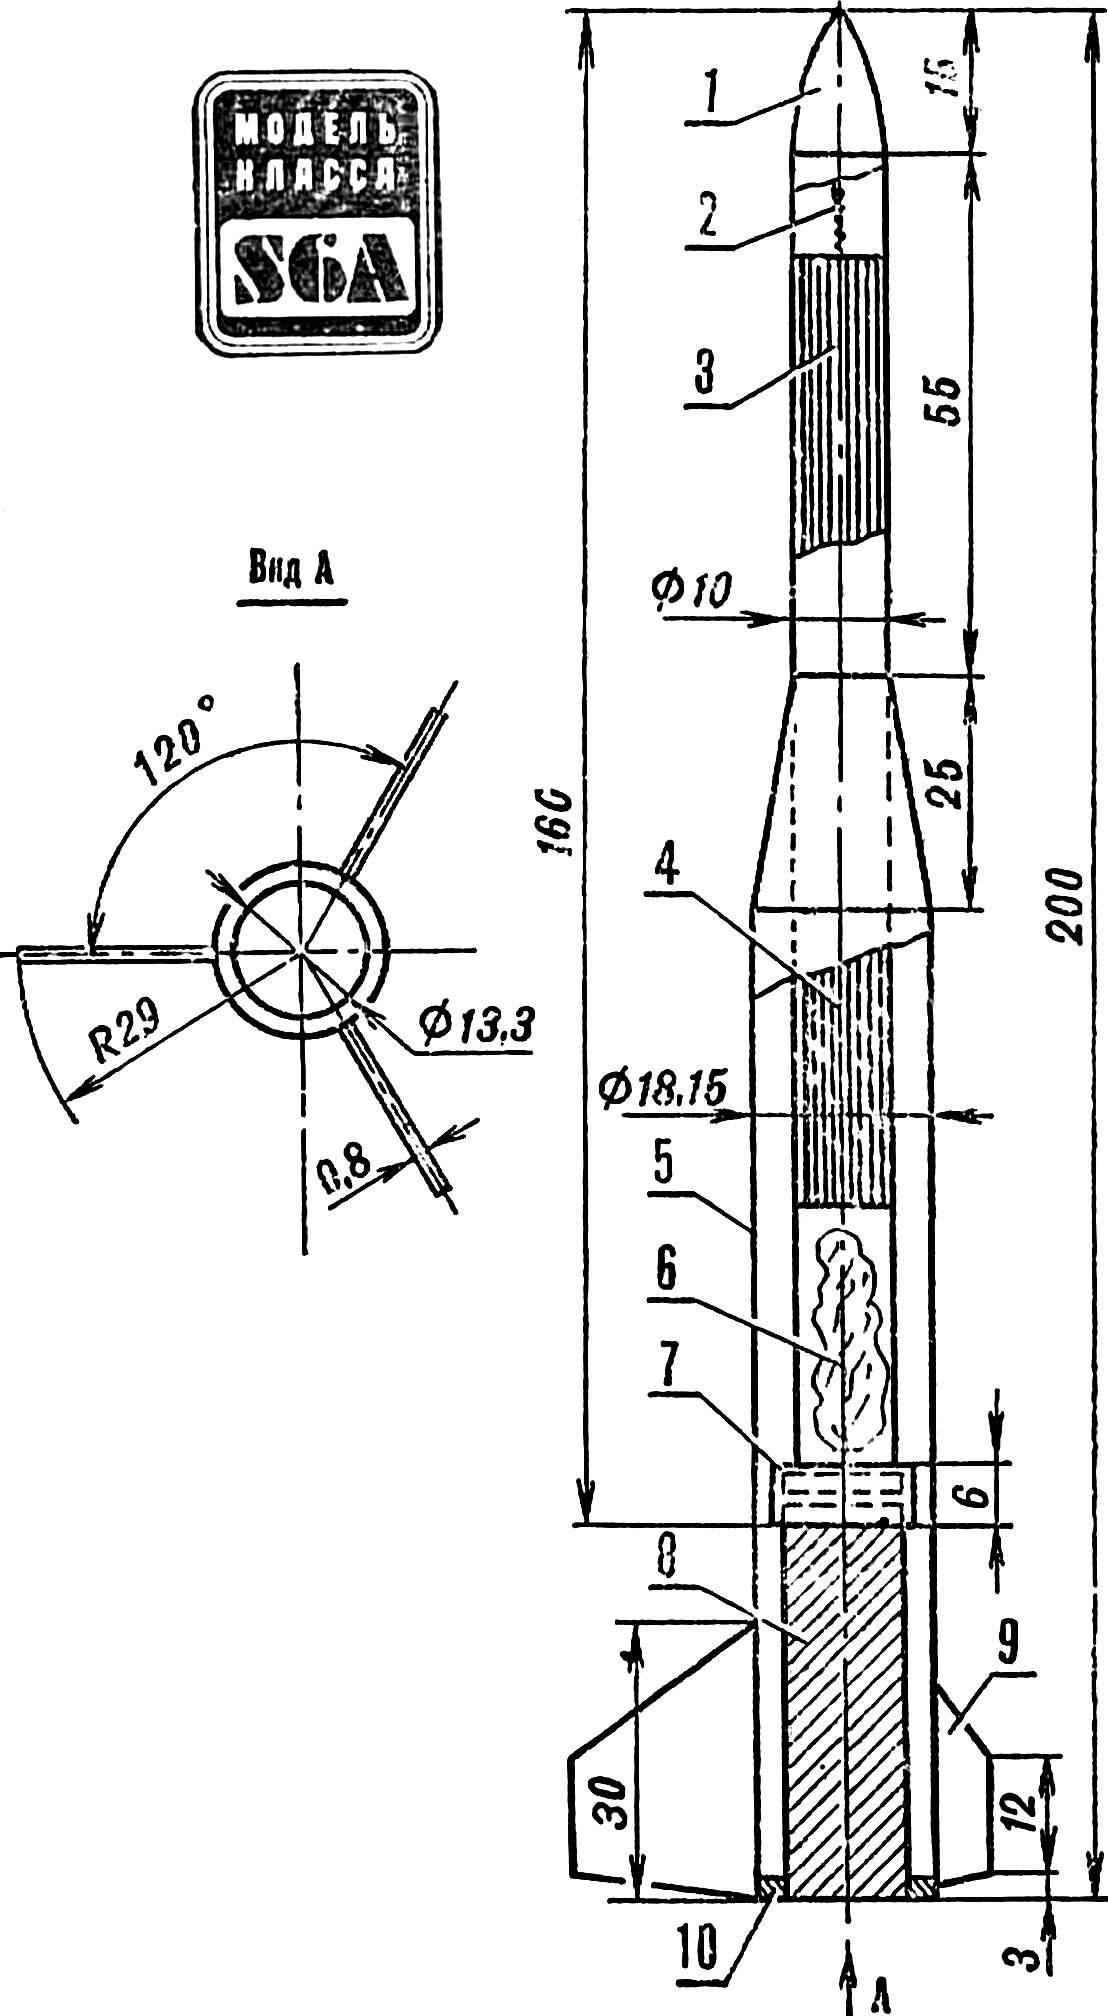 Рис. 4. Модель класса S6A В. Луничкина.